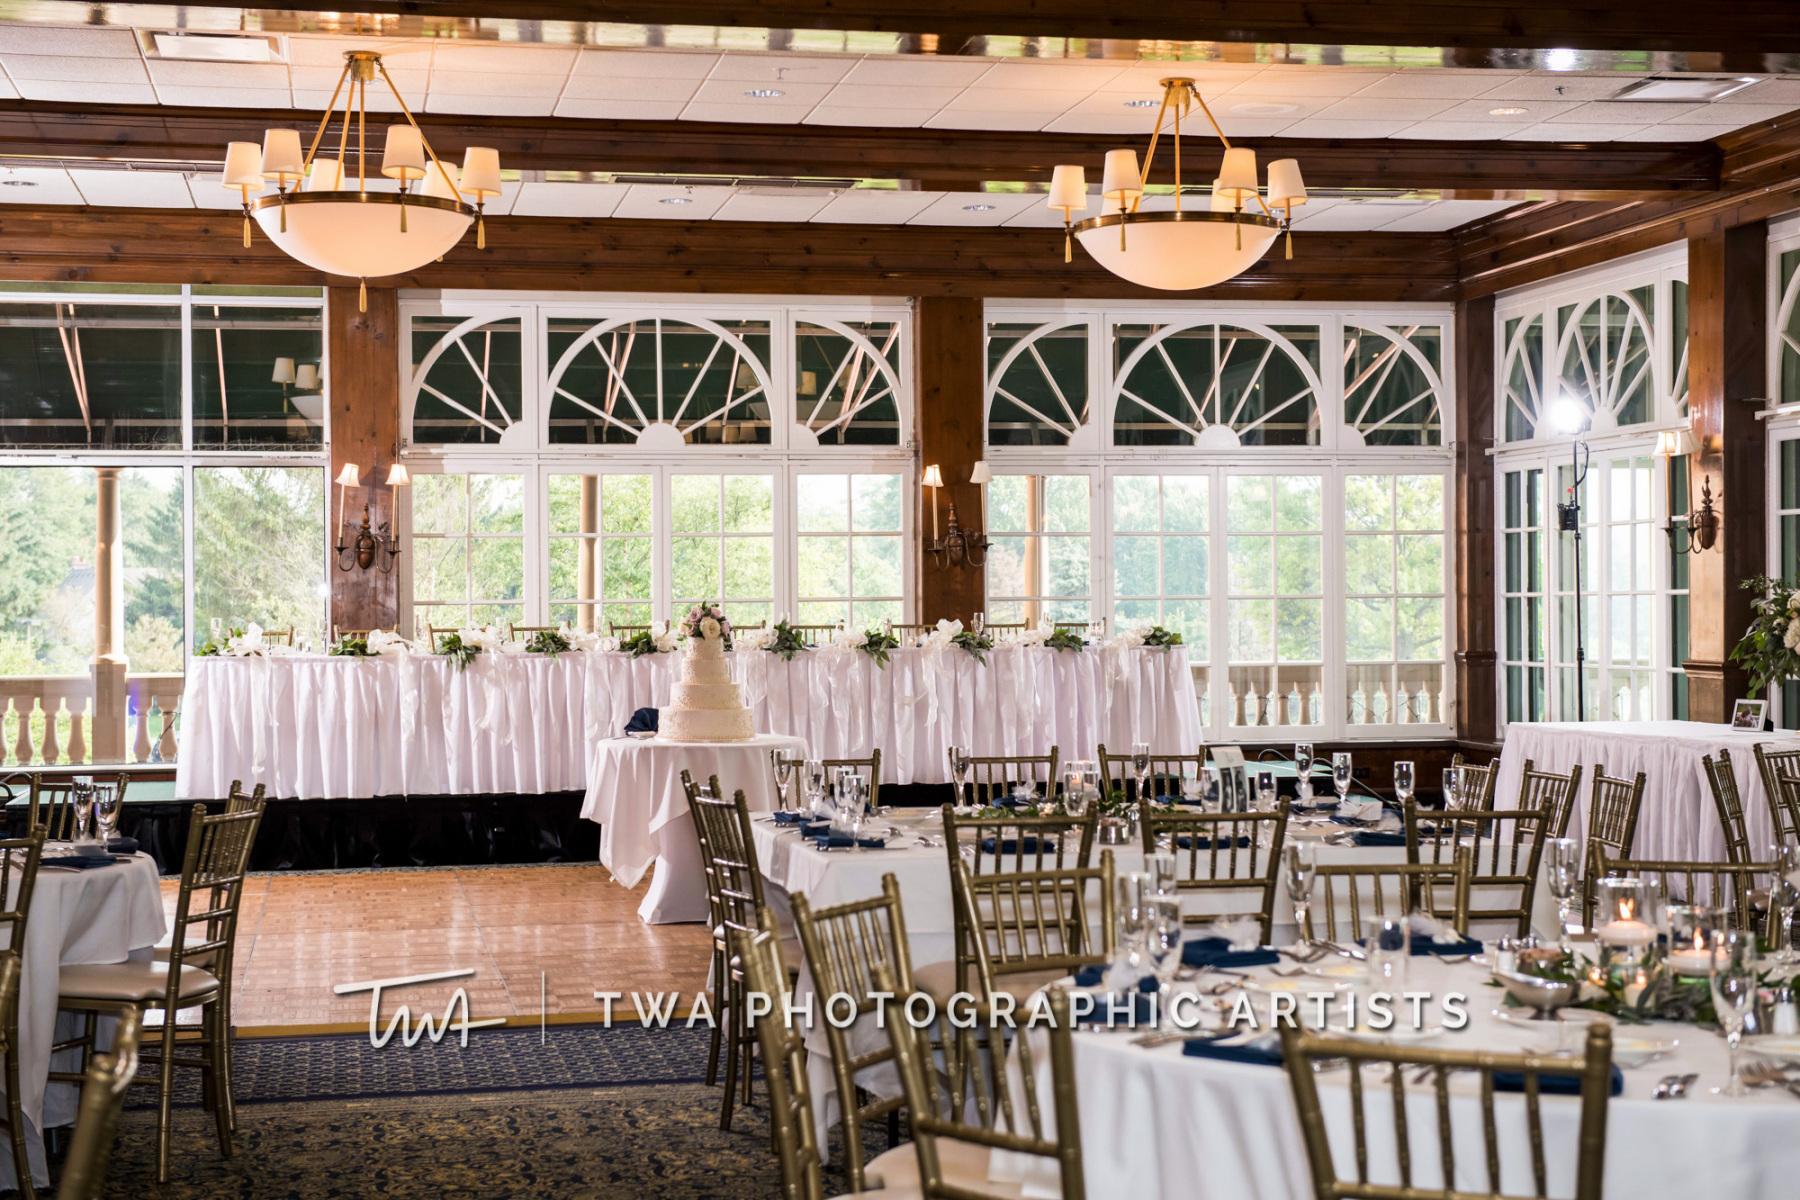 Chicago-Wedding-Photographer-TWA-Photographic-Artists-Drake-Oak-Brook_Johnson_Bartz_MZ_CL-0817